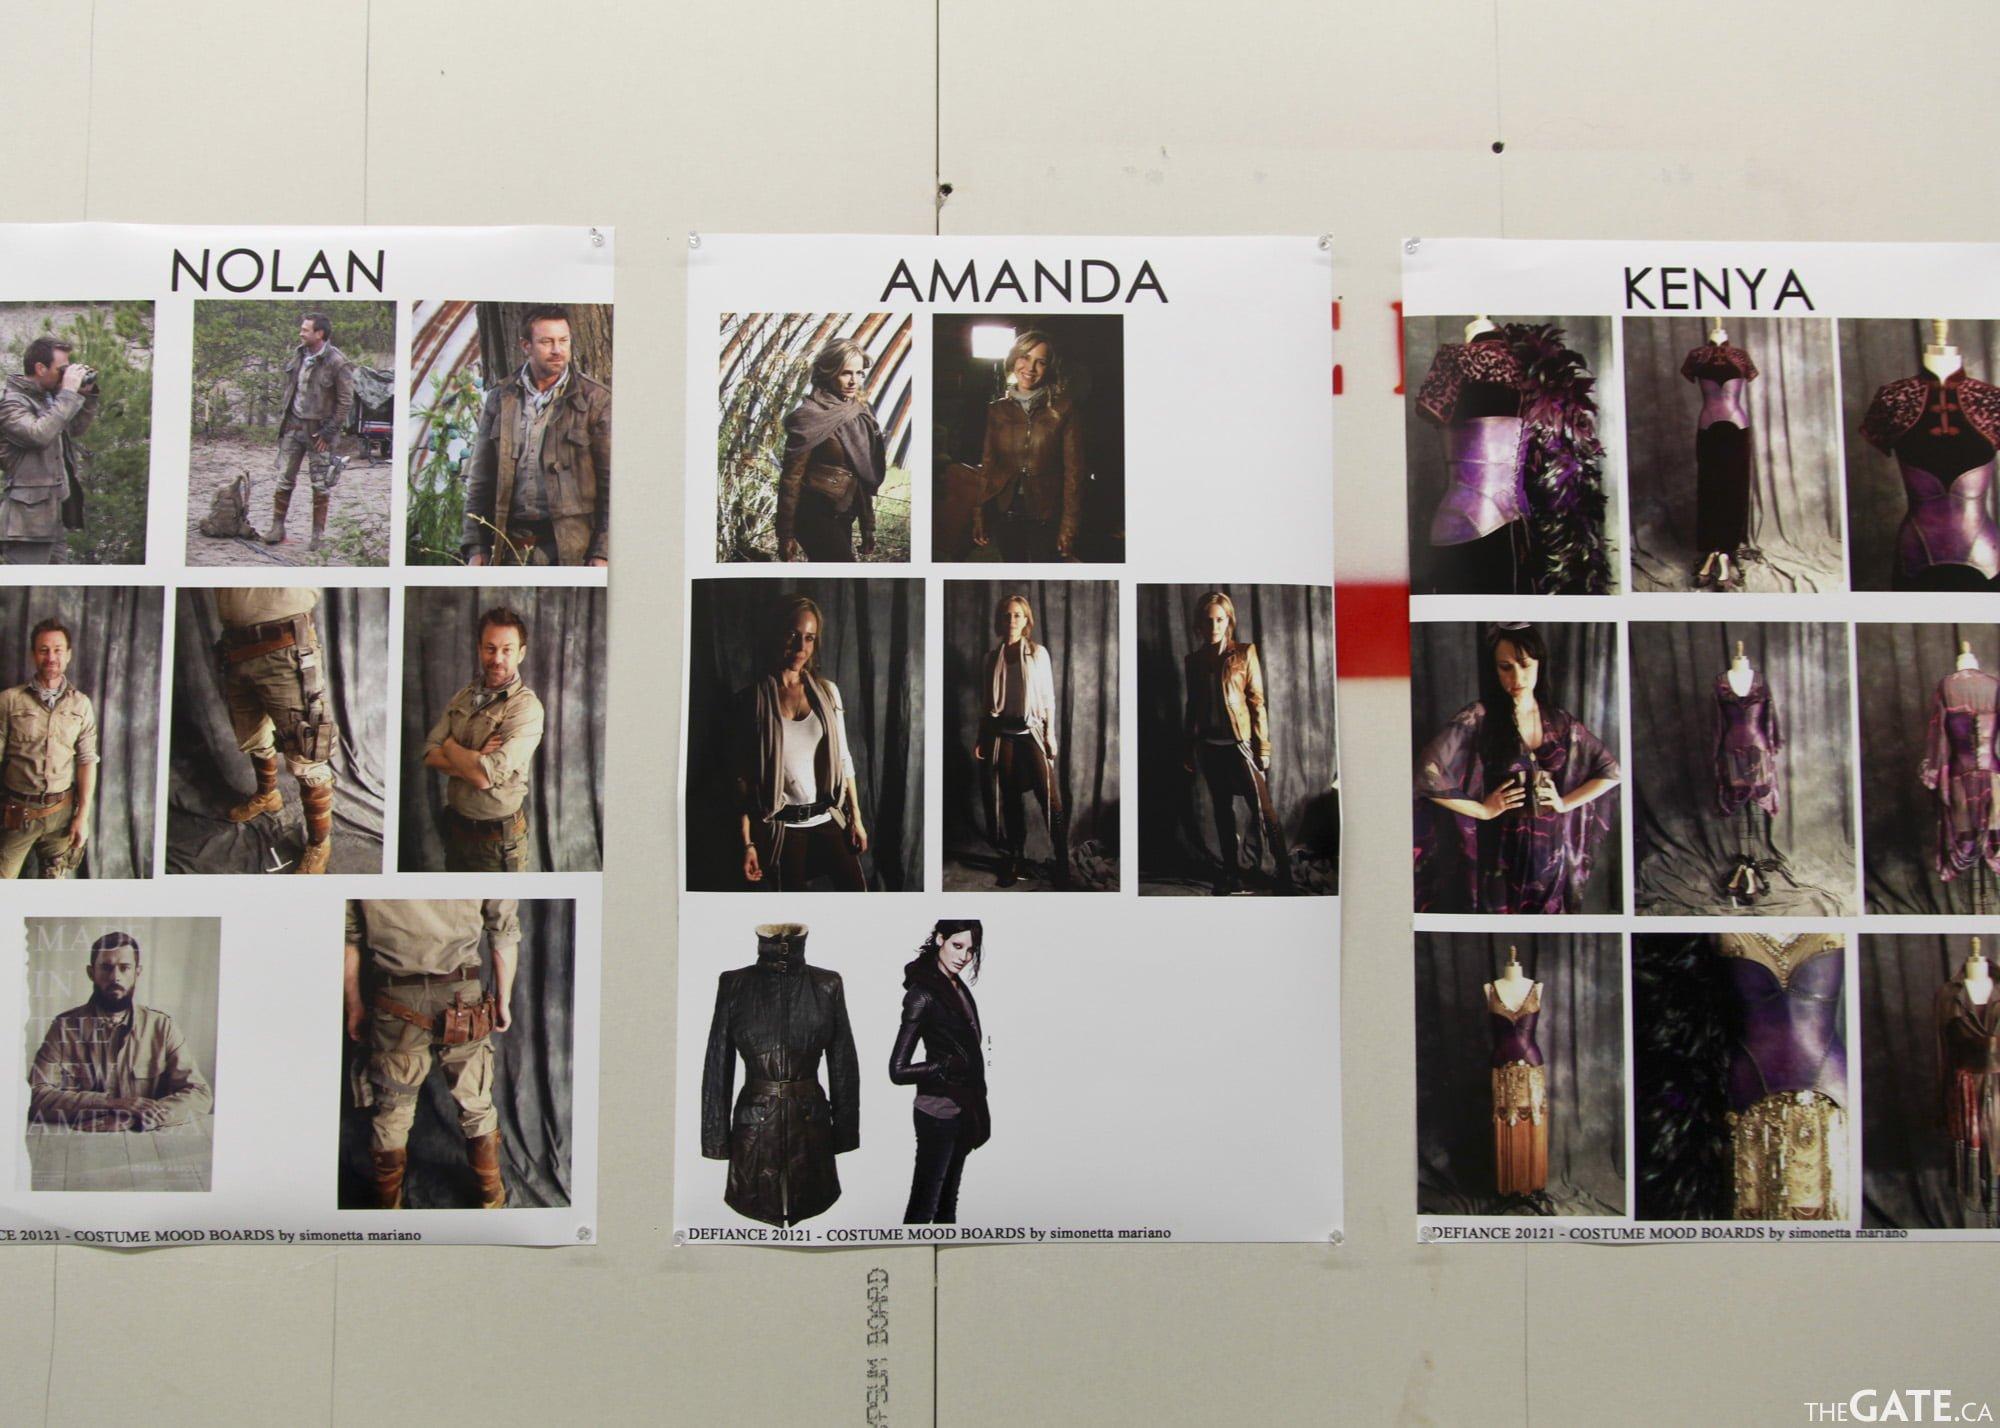 Costume test images - Nolan, Amanda, Kenya